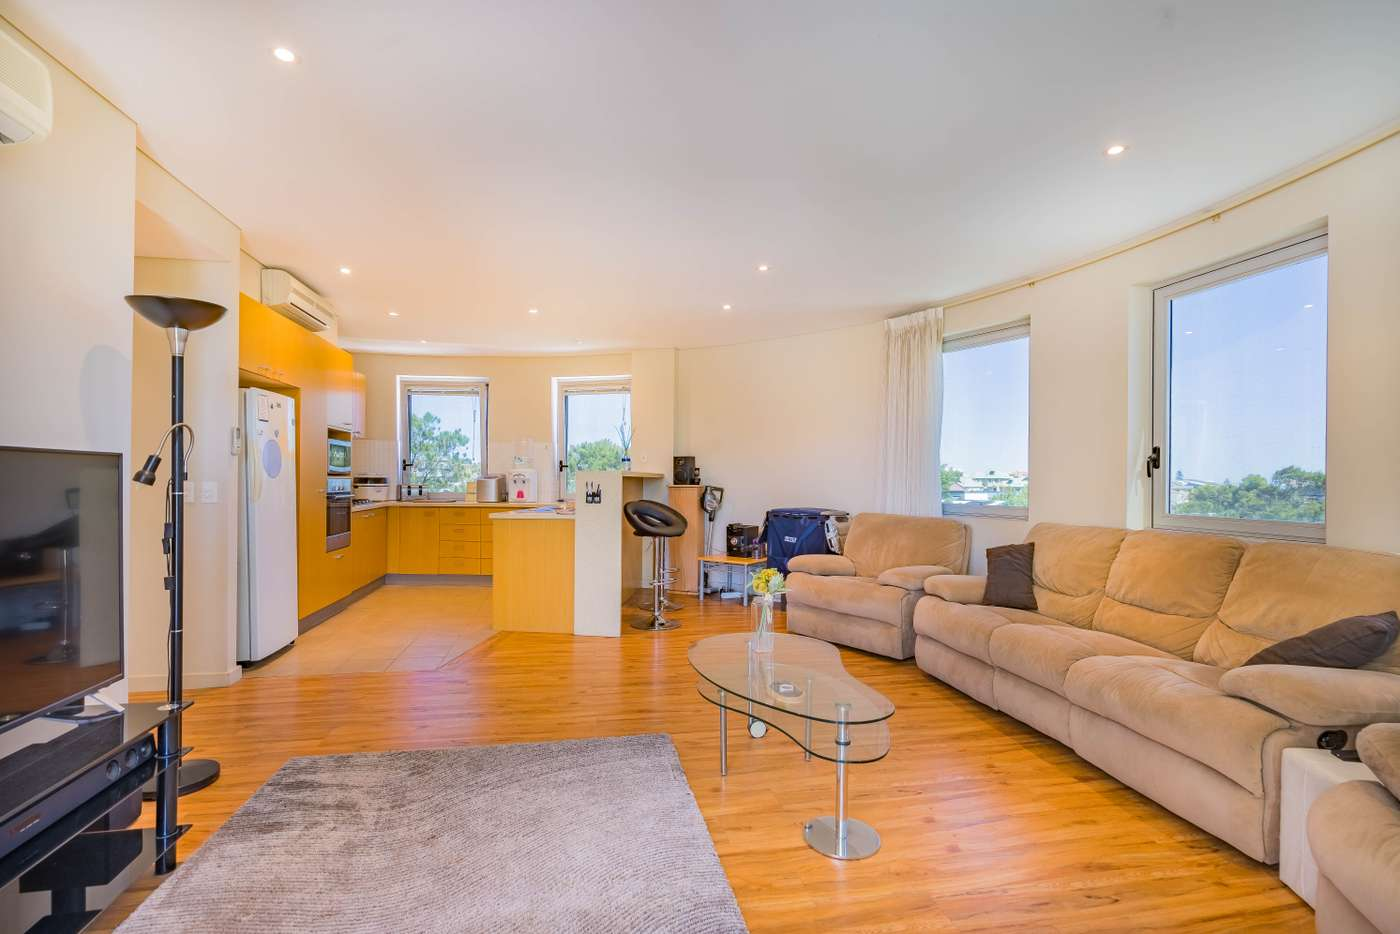 Main view of Homely apartment listing, 22/ 11-19 Casuarina Drive, Bunbury WA 6230